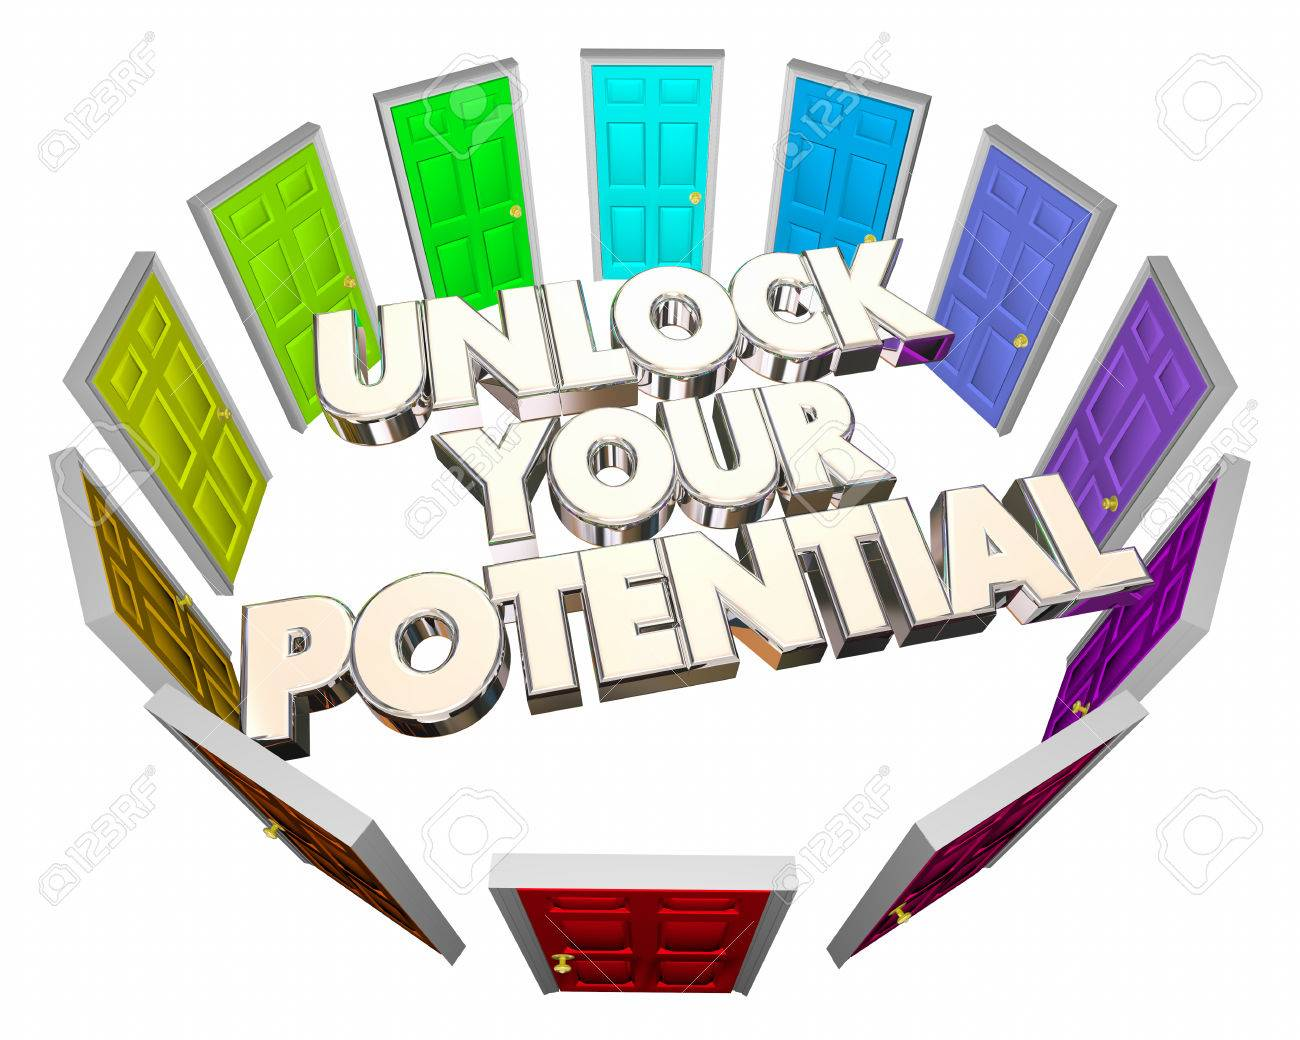 unlock your potential doors future skills abilities d illustration unlock your potential doors future skills abilities 3d illustration